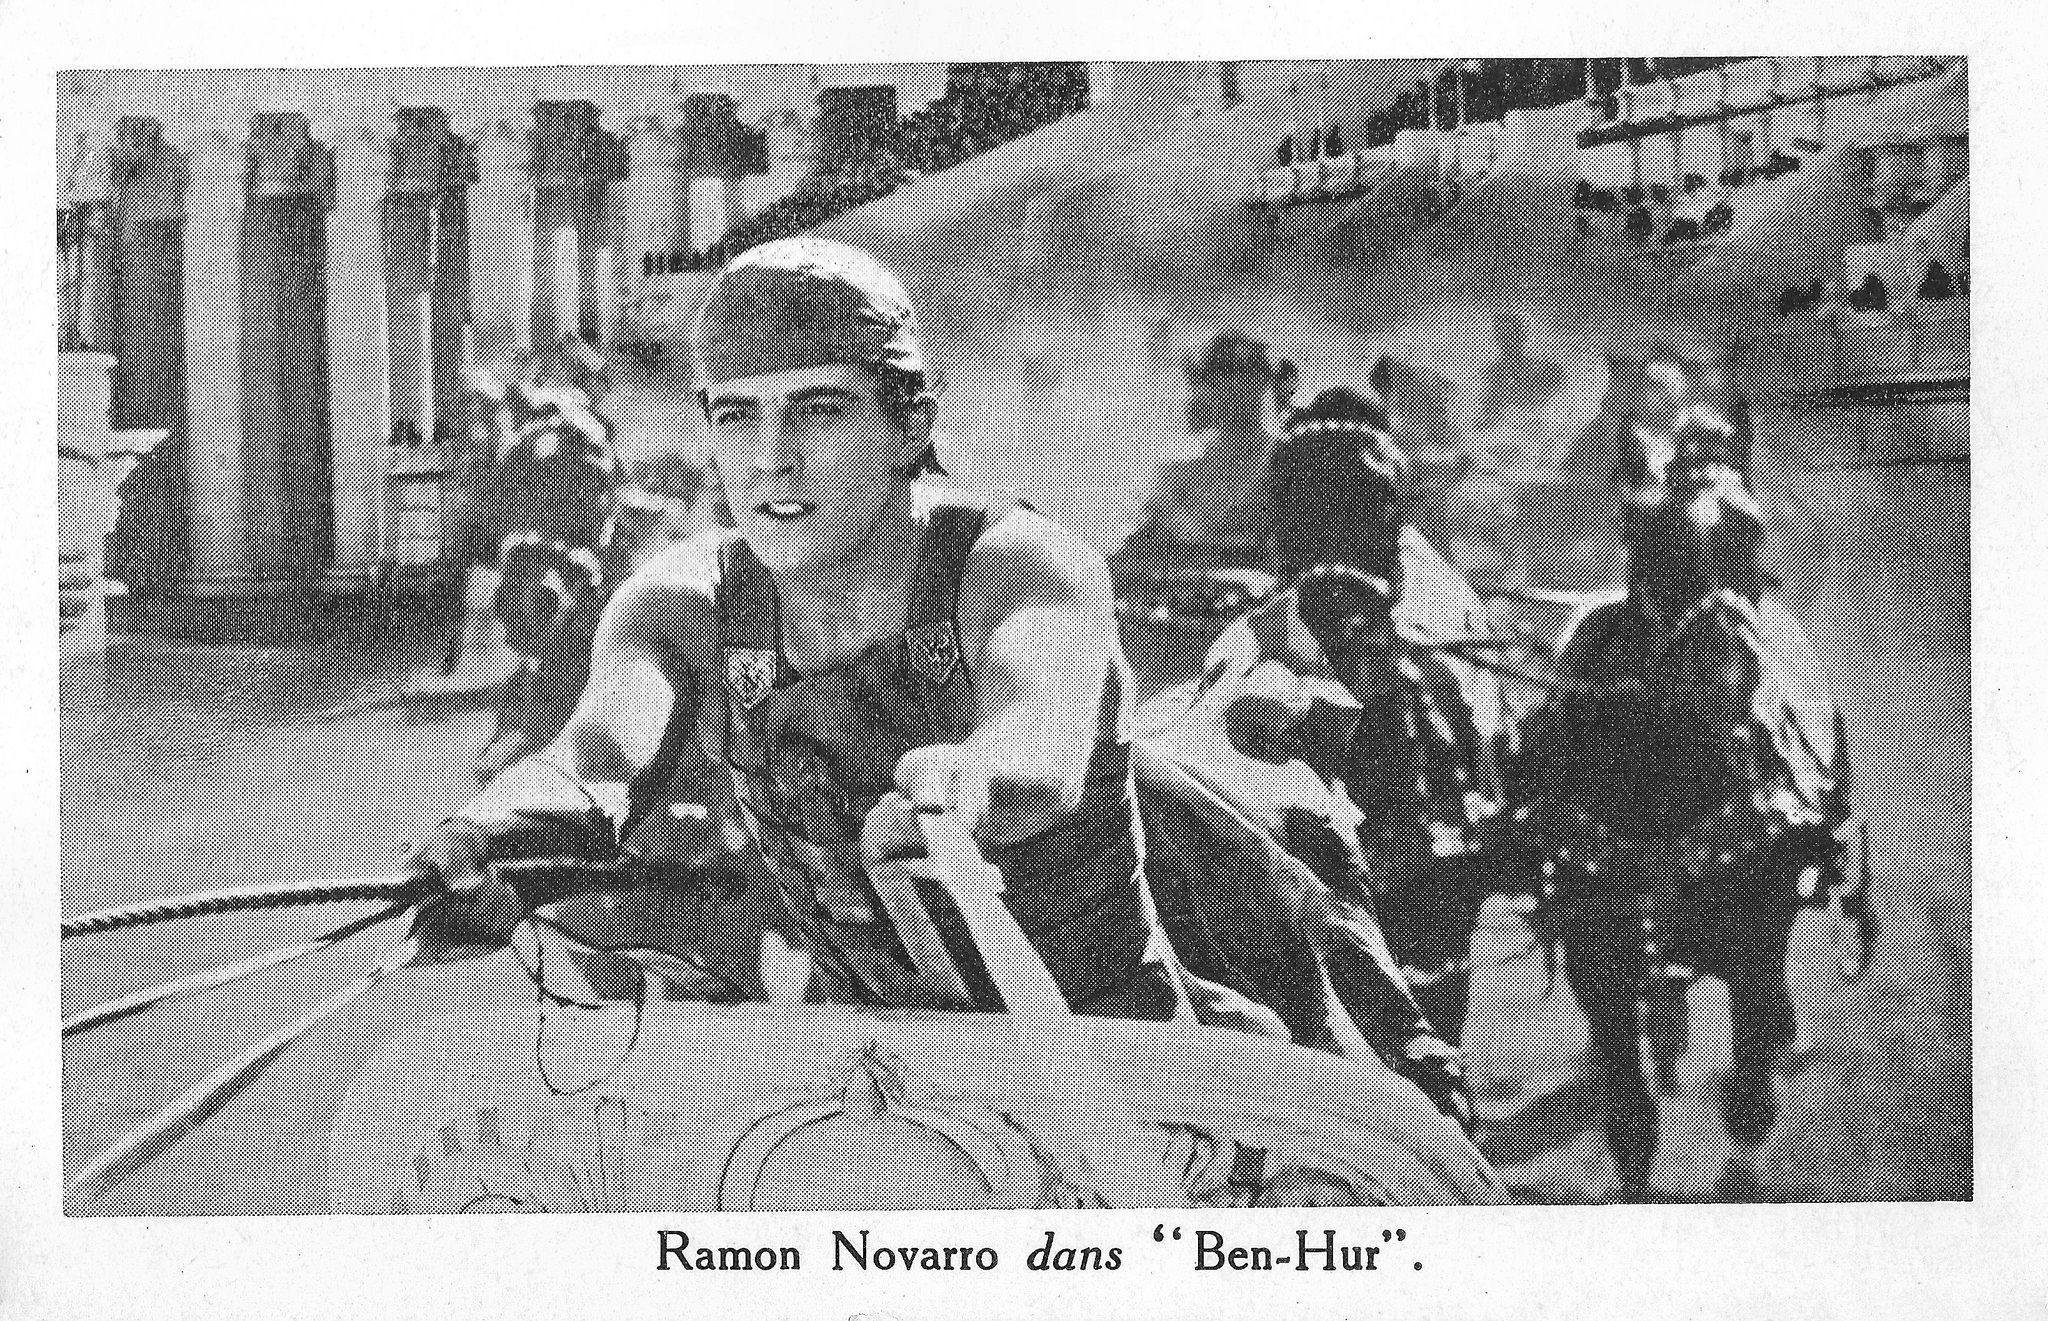 https://flic.kr/p/CgspRS | Ramon Novarro in Ben Hur (1926) | French postcard by Cinema Madeleine, Paris. Photo: publicity still for  Ben-Hur: A Tale of the Christ  (Fred Niblo, 1925). Capture: Chariot race in Ben-Hur.